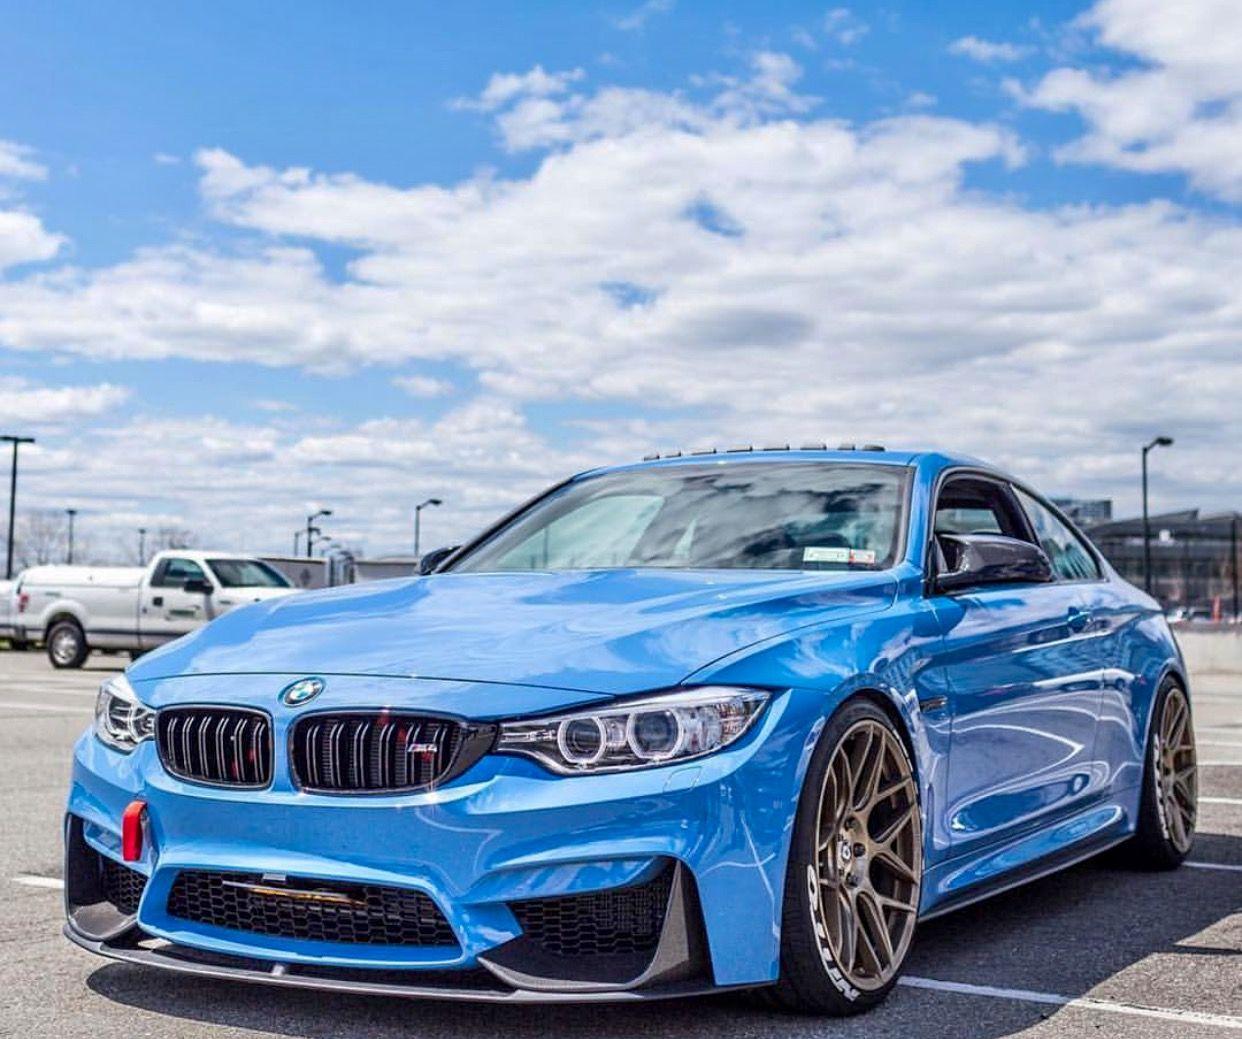 Bmw M4: BMW ///M4 I B-lew M-y W-hat?!?! Sweet Blue, Sweet Beamer